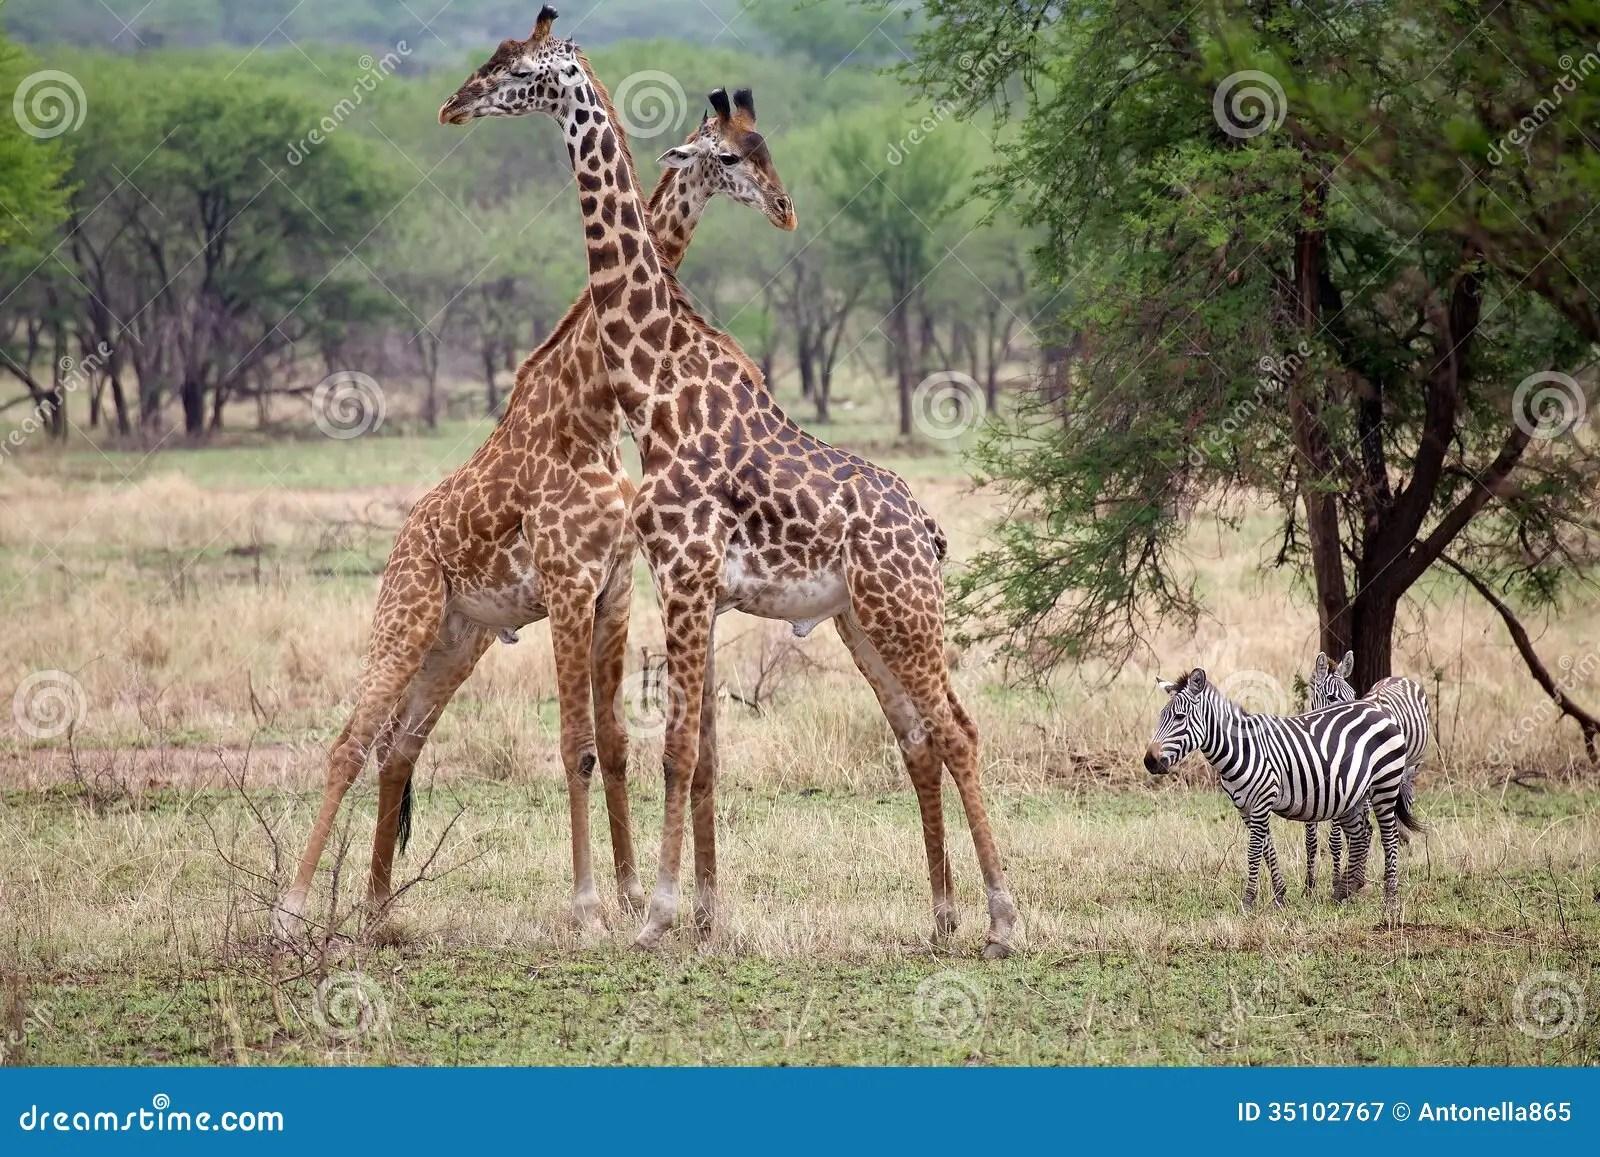 Giraffe Giraffa Camelopardalis And Zebra Equus